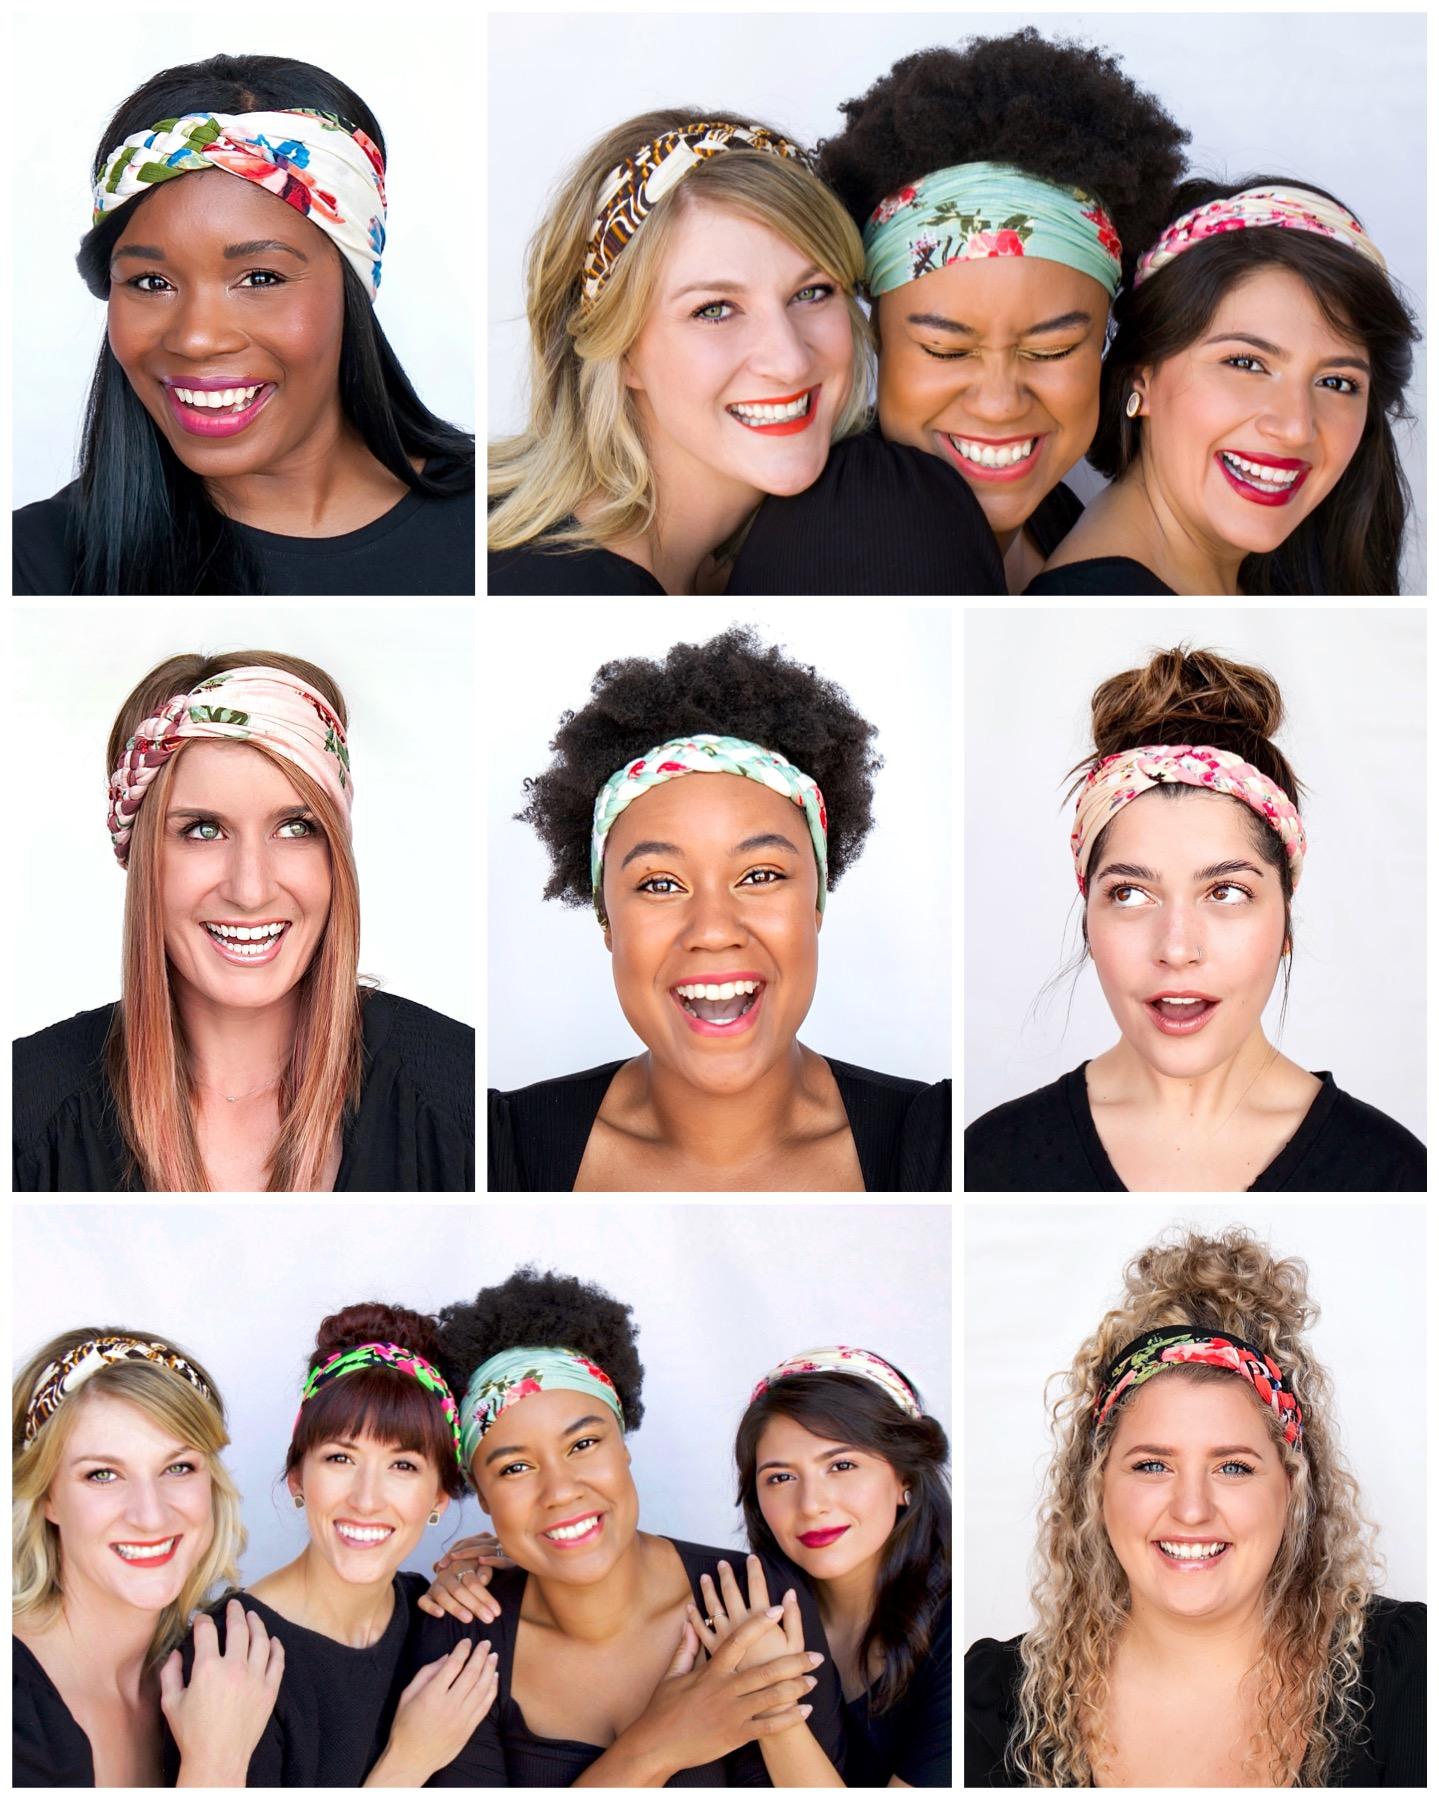 Regenerous Designs Big Braided Headbands on several beautiful models